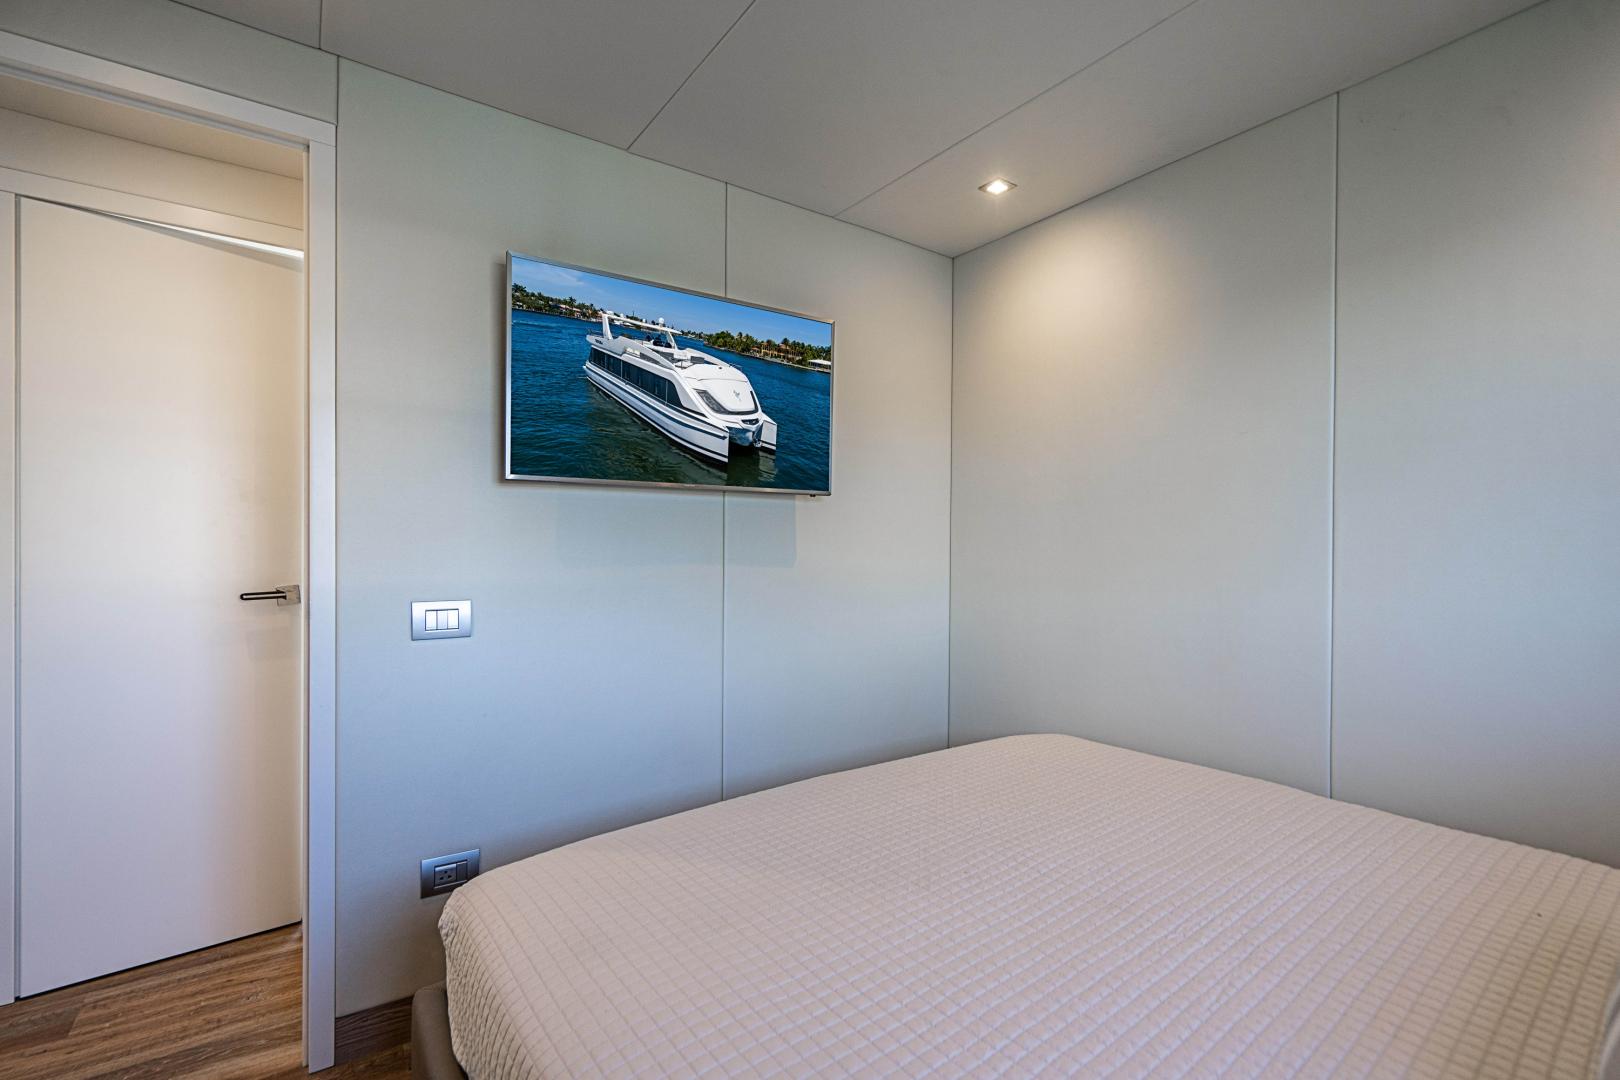 Overblue-58 Power Catamaran 2017-Techuila Ft. Lauderdale-Florida-United States-2017 Overblue 58 Powercat-1401142   Thumbnail